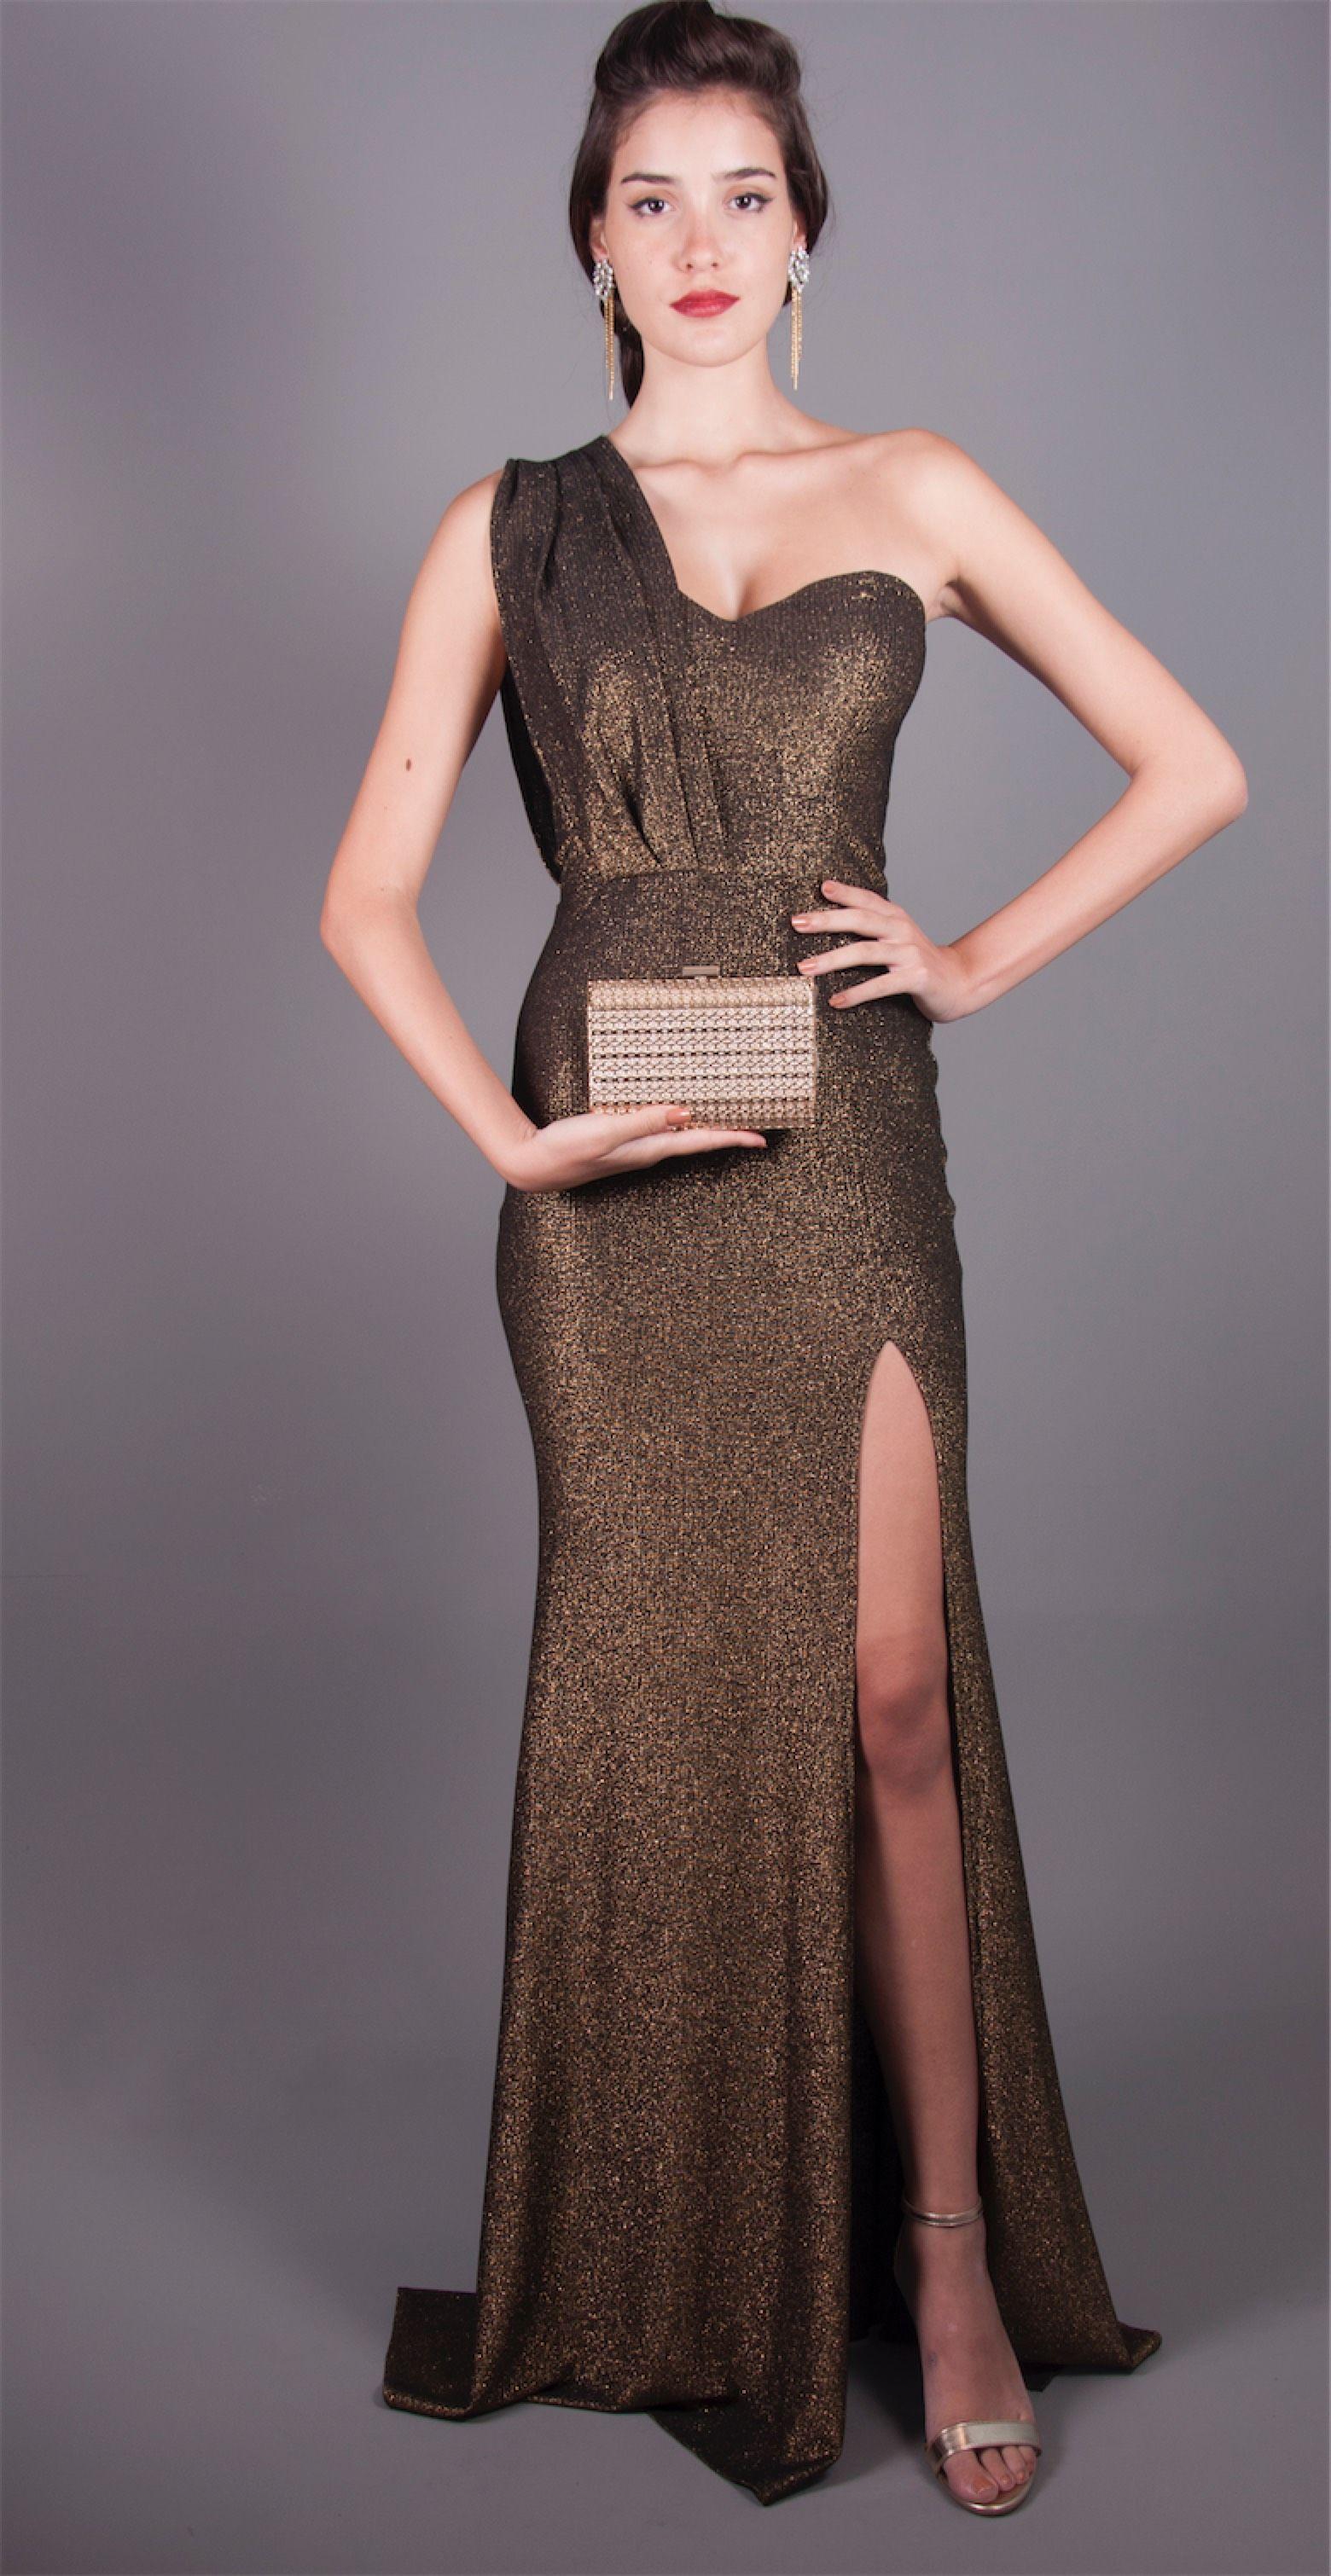 2019 Com Imagens Vestido Formal Vestido Lurex Vestidos